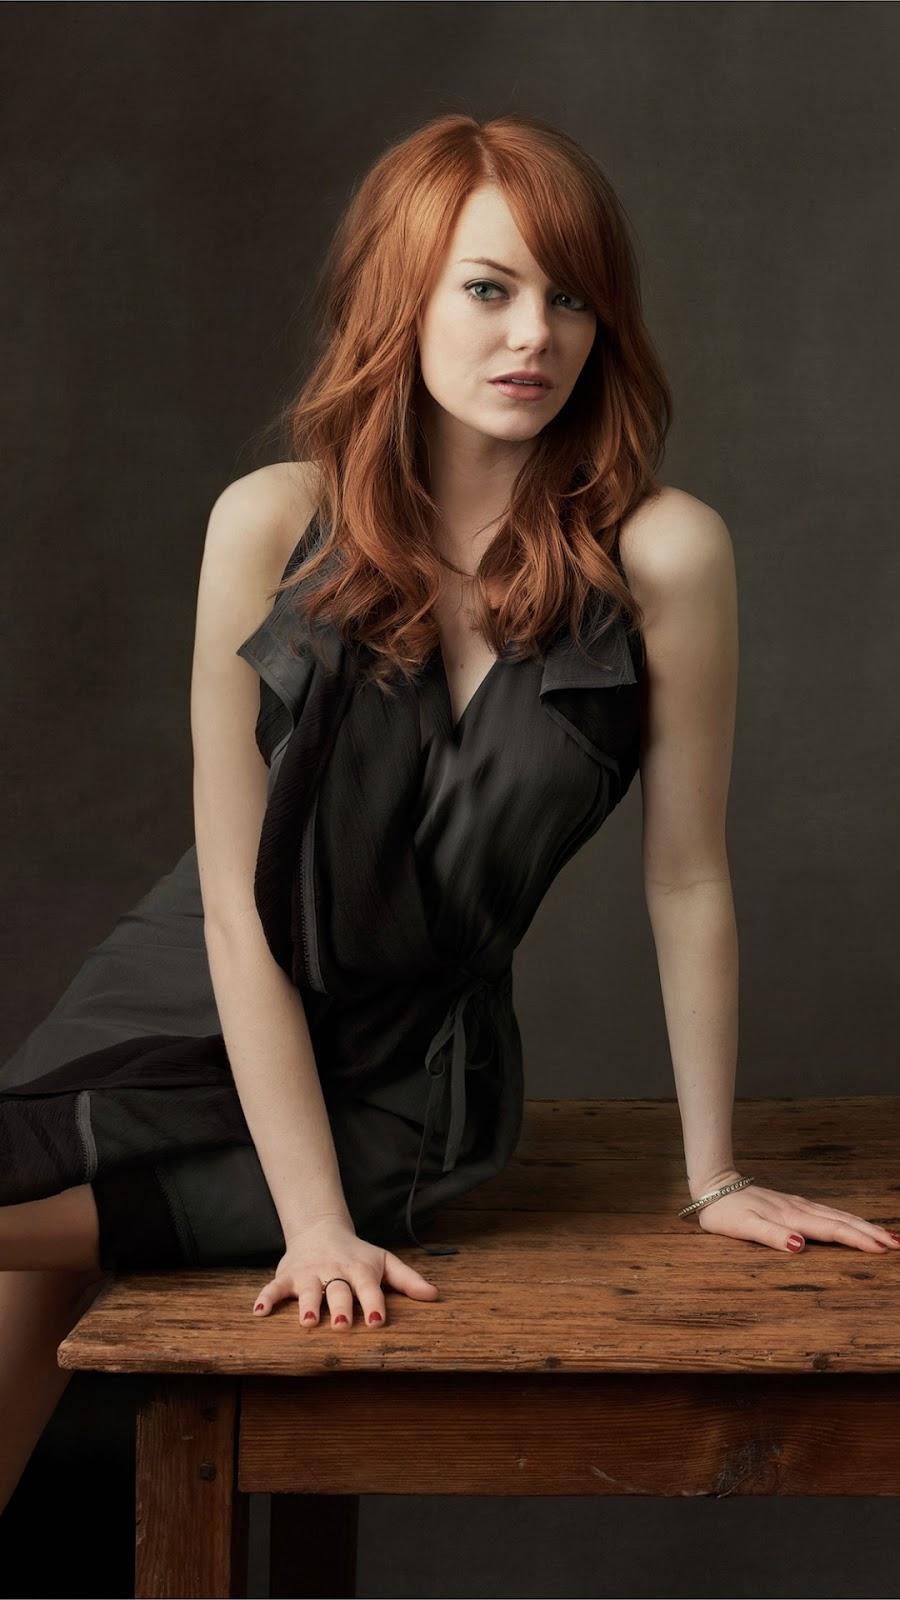 Emma Stone Net Worth Pics Movies TV Shows And Biography   RadVirals 900x1600